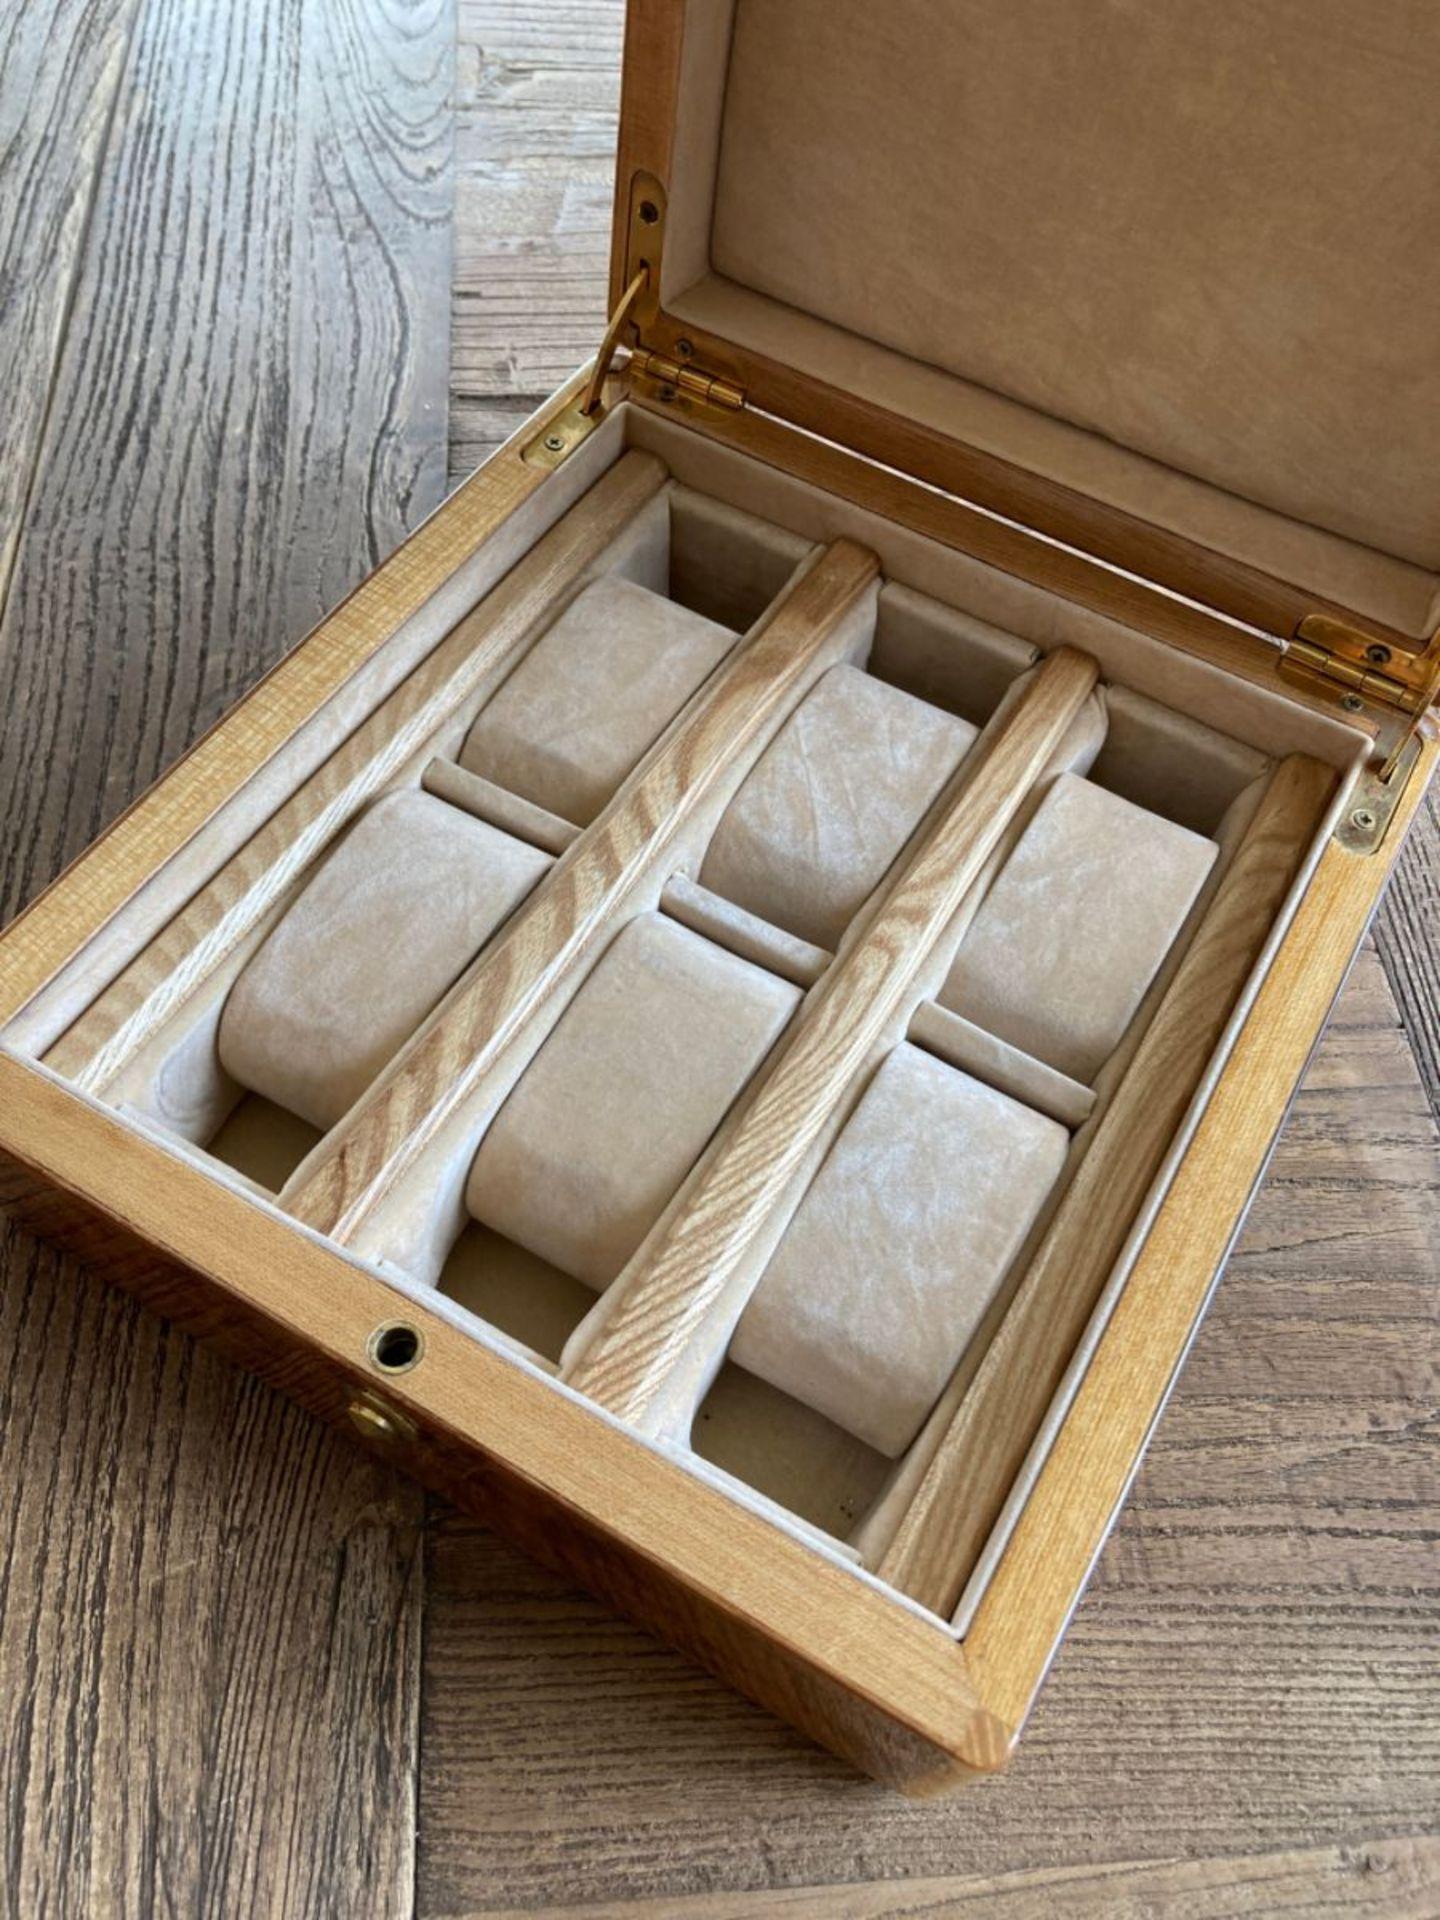 WATCH CASE/ WATCH STORAGE & DISPLAY BOX - Image 3 of 4